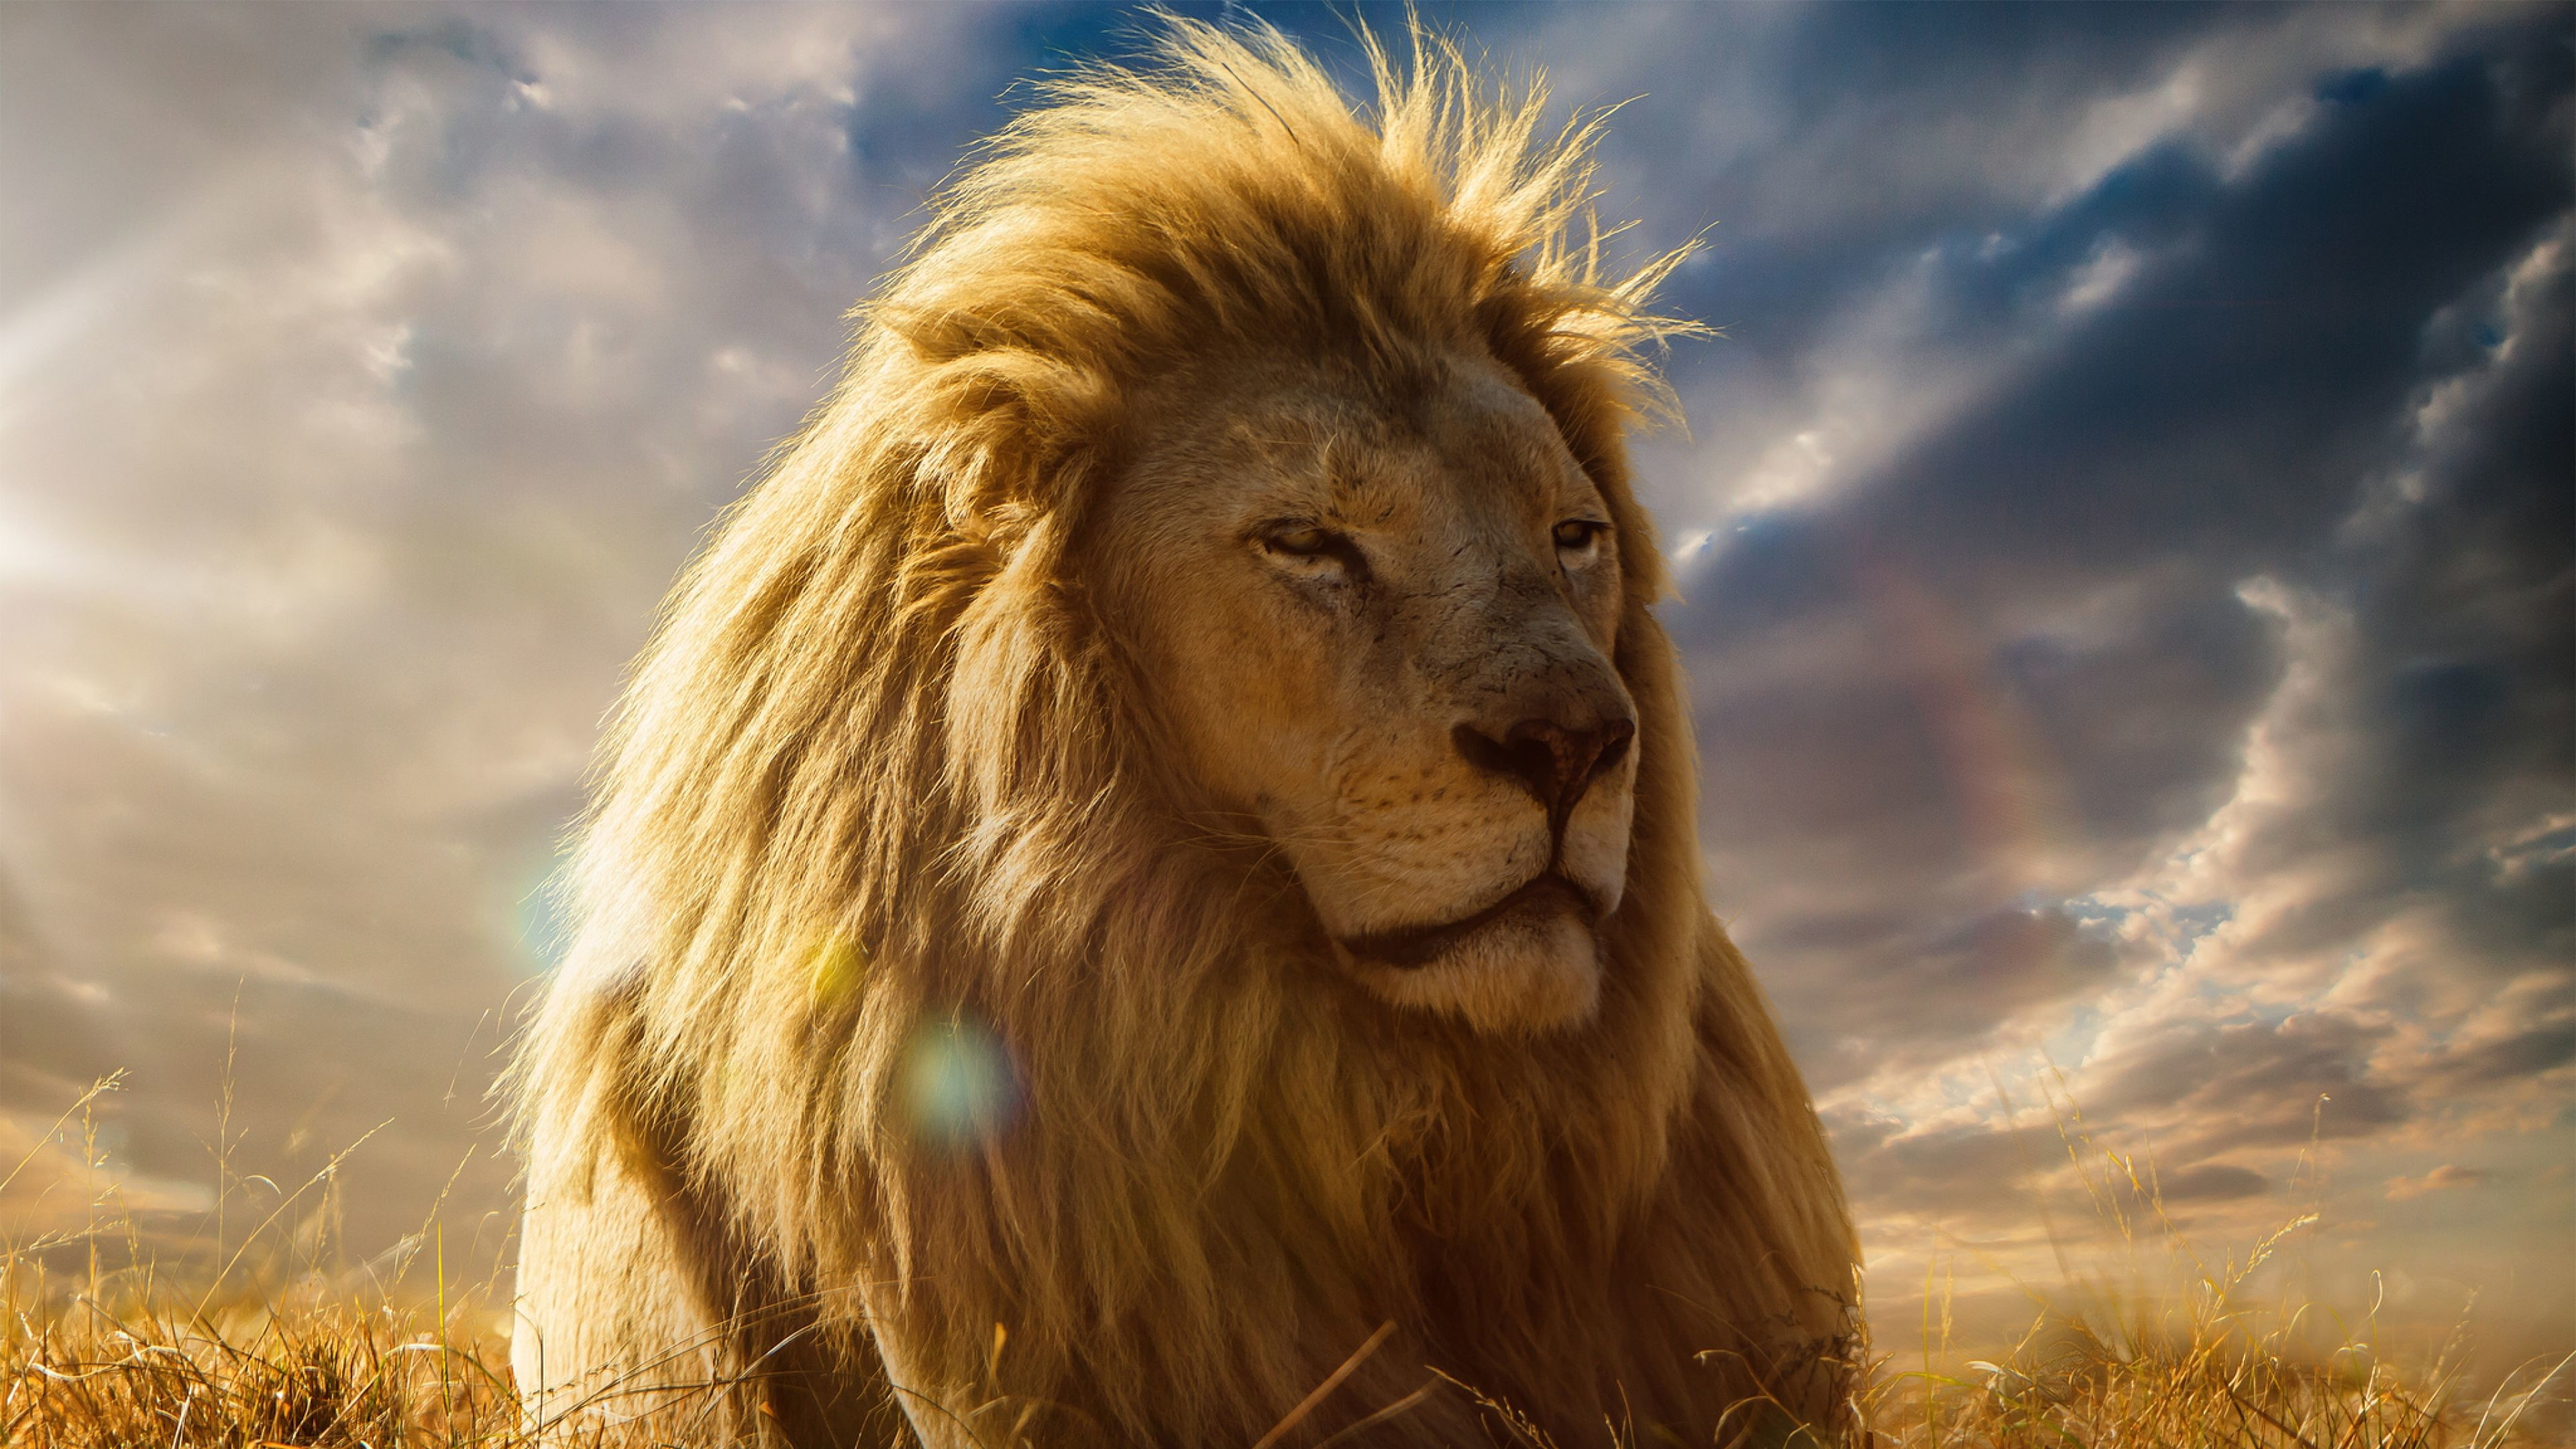 Res: 3840x2160, K Ultra HD Lion Wallpapers HD Desktop Backgrounds x